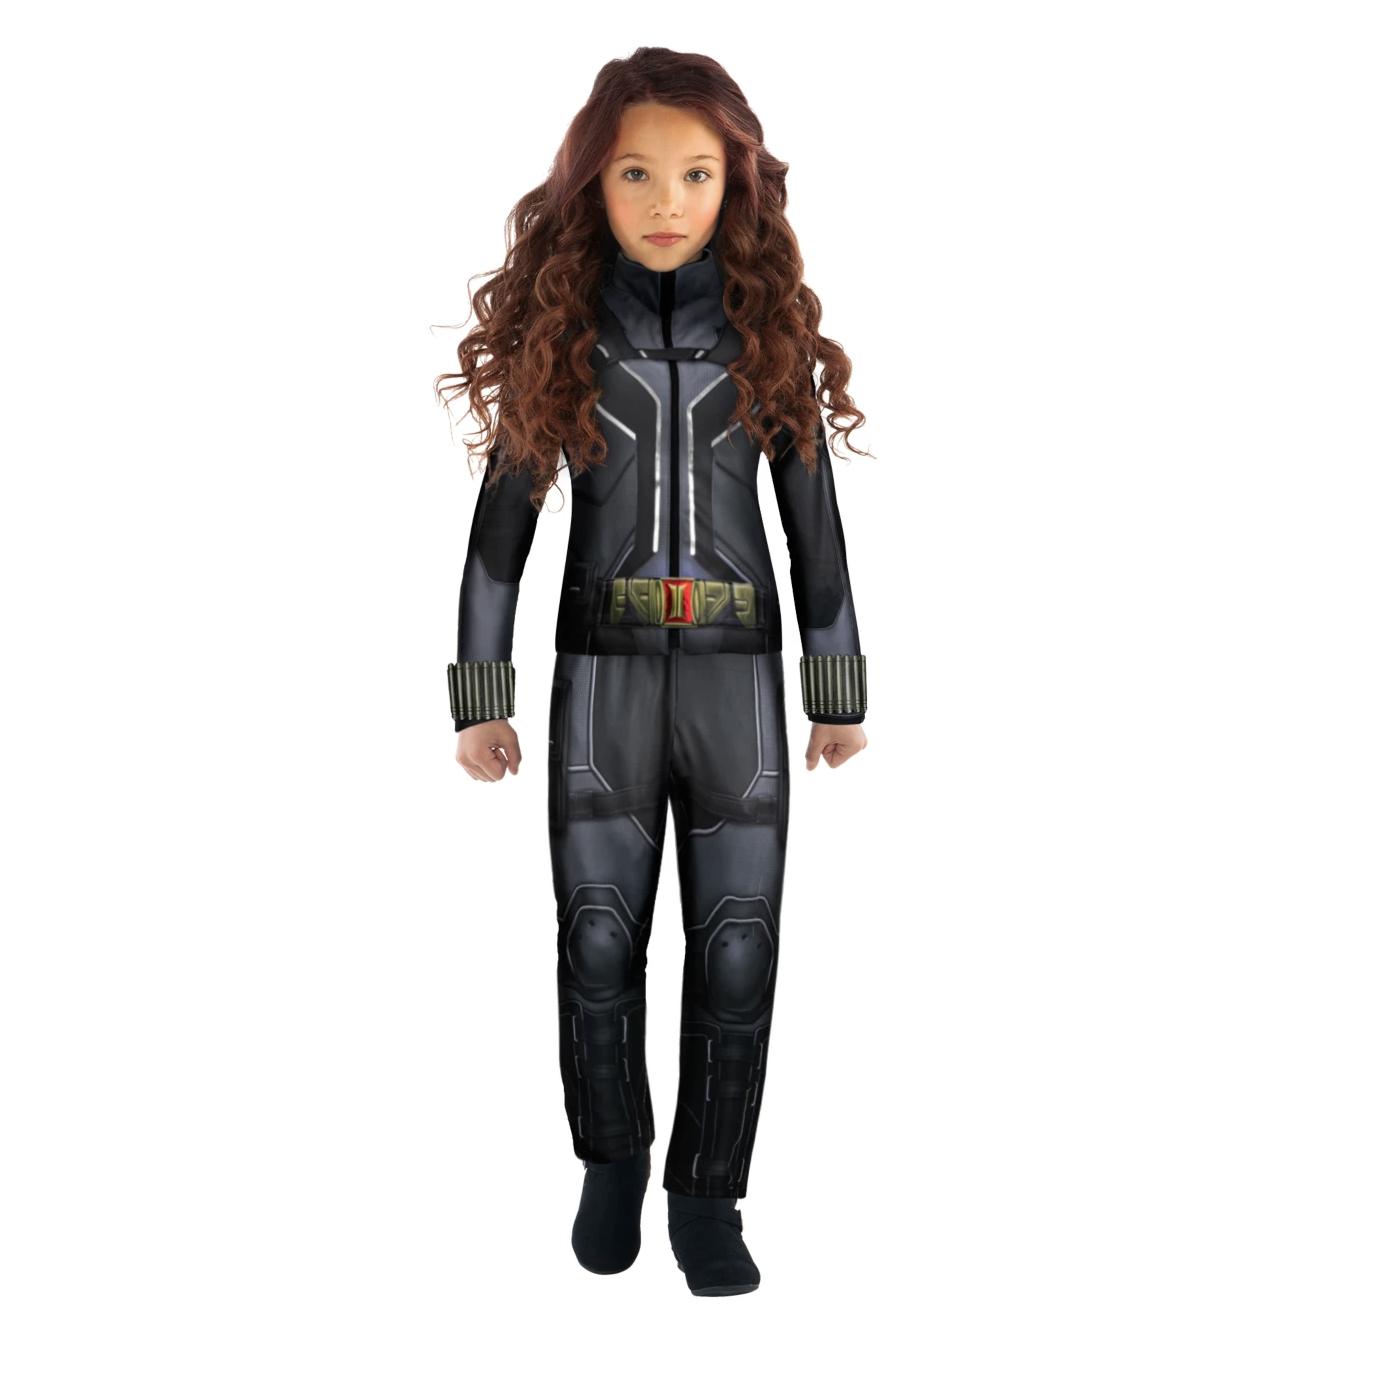 Black Widow kid costume